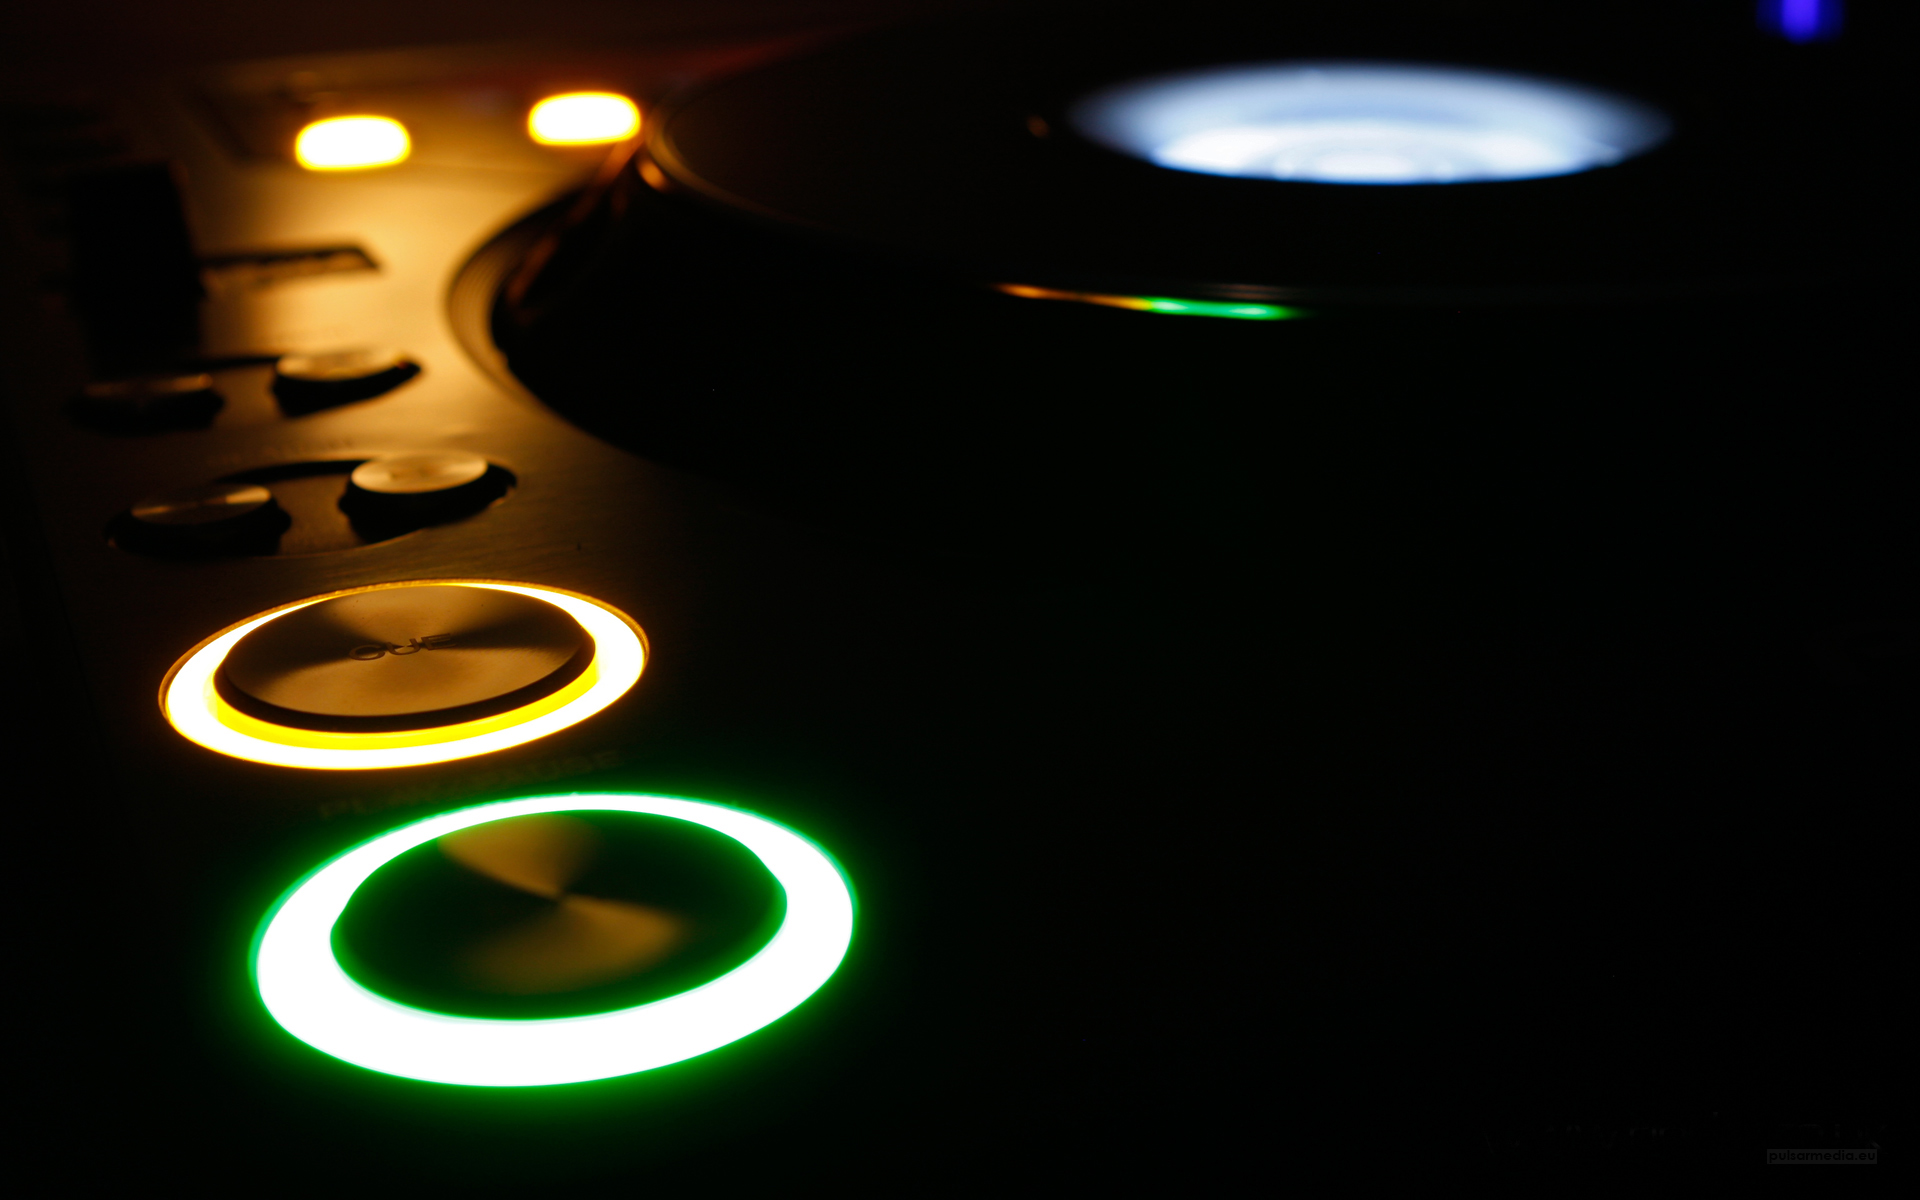 44+] Pioneer DJ Wallpaper HD on WallpaperSafari